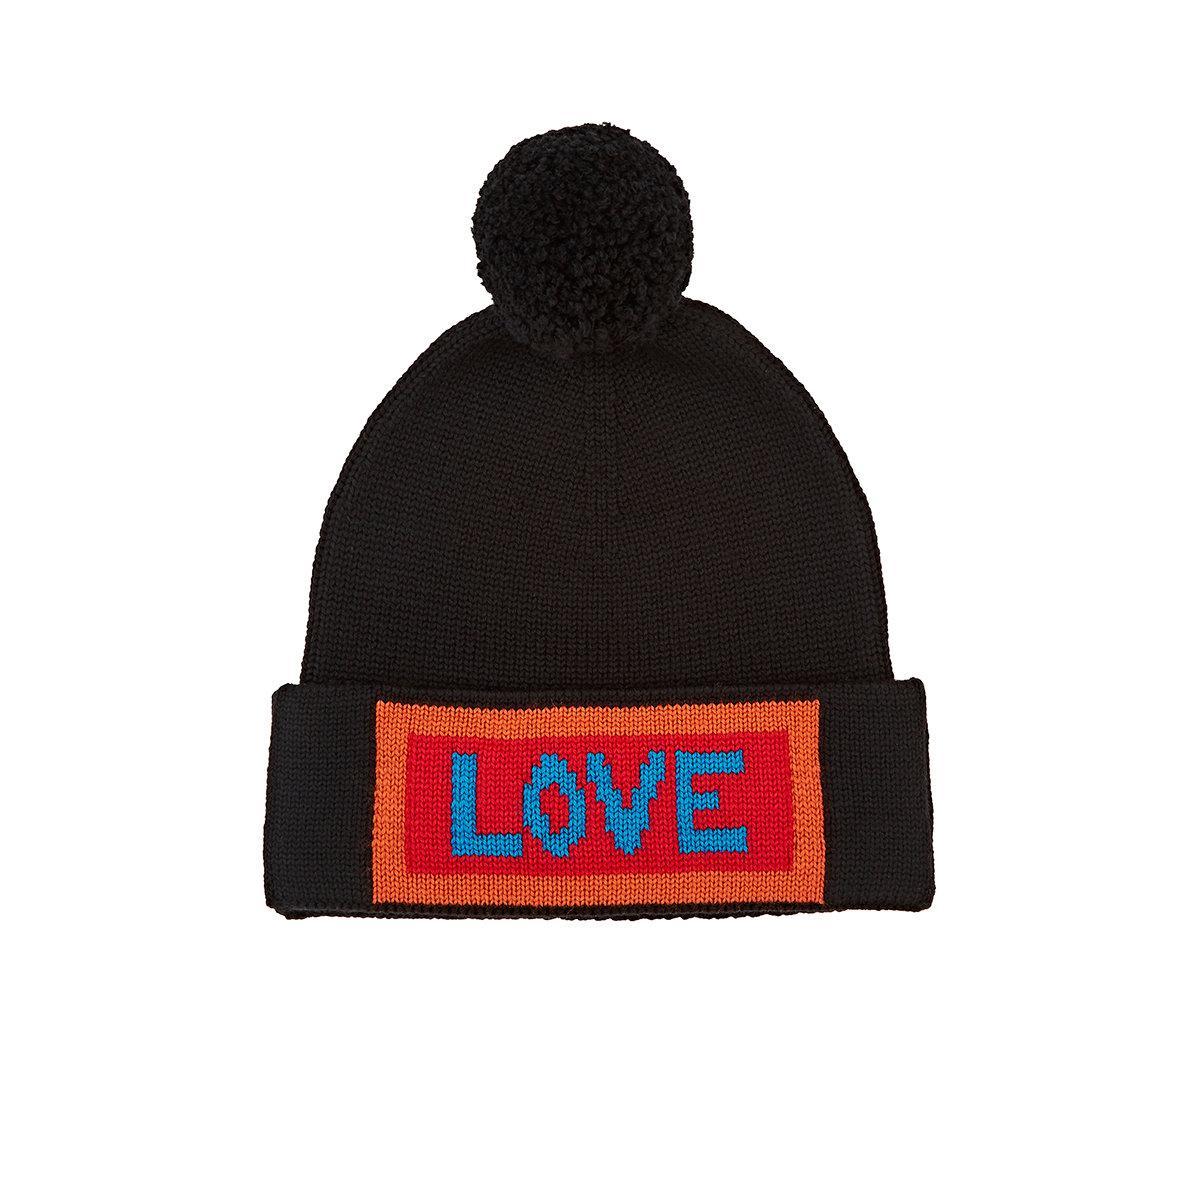 Black Love Beanie Fendi 9Dy0gfCOSv